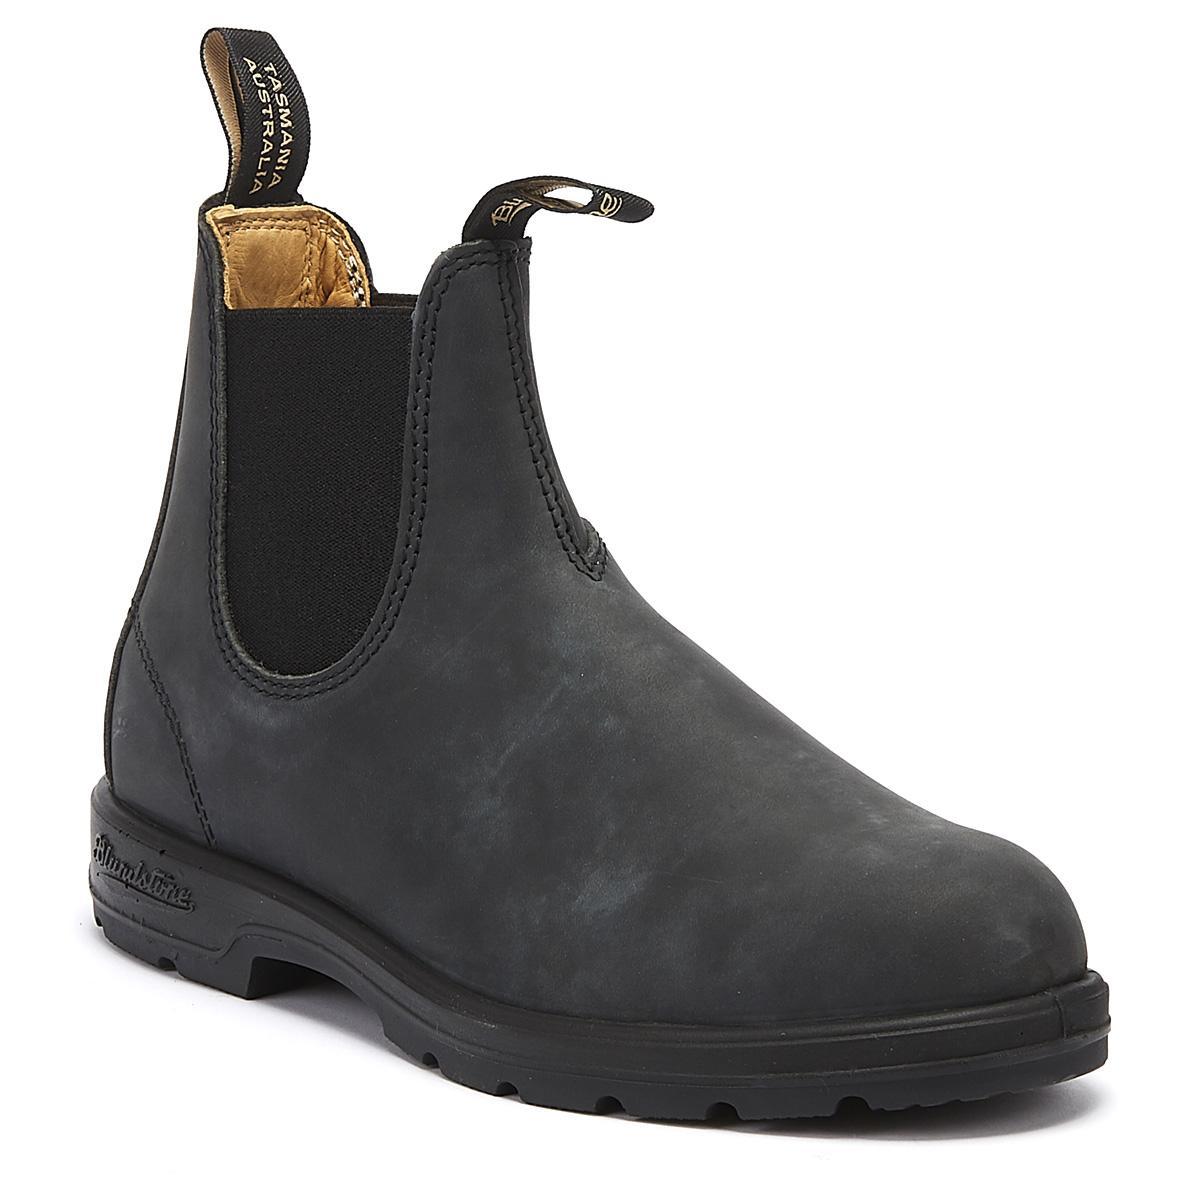 0d710644e824 Lyst - Blundstone 587 Mens Rustic Black Boots in Black for Men